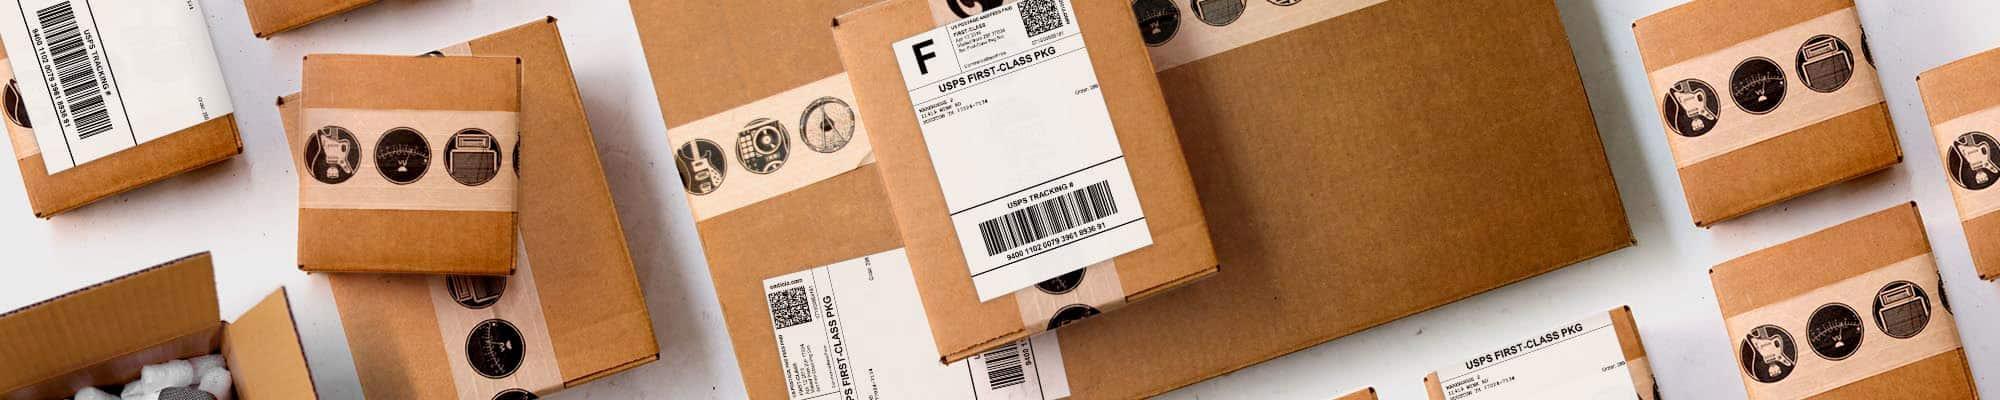 International Shipping Guide | Reverb News